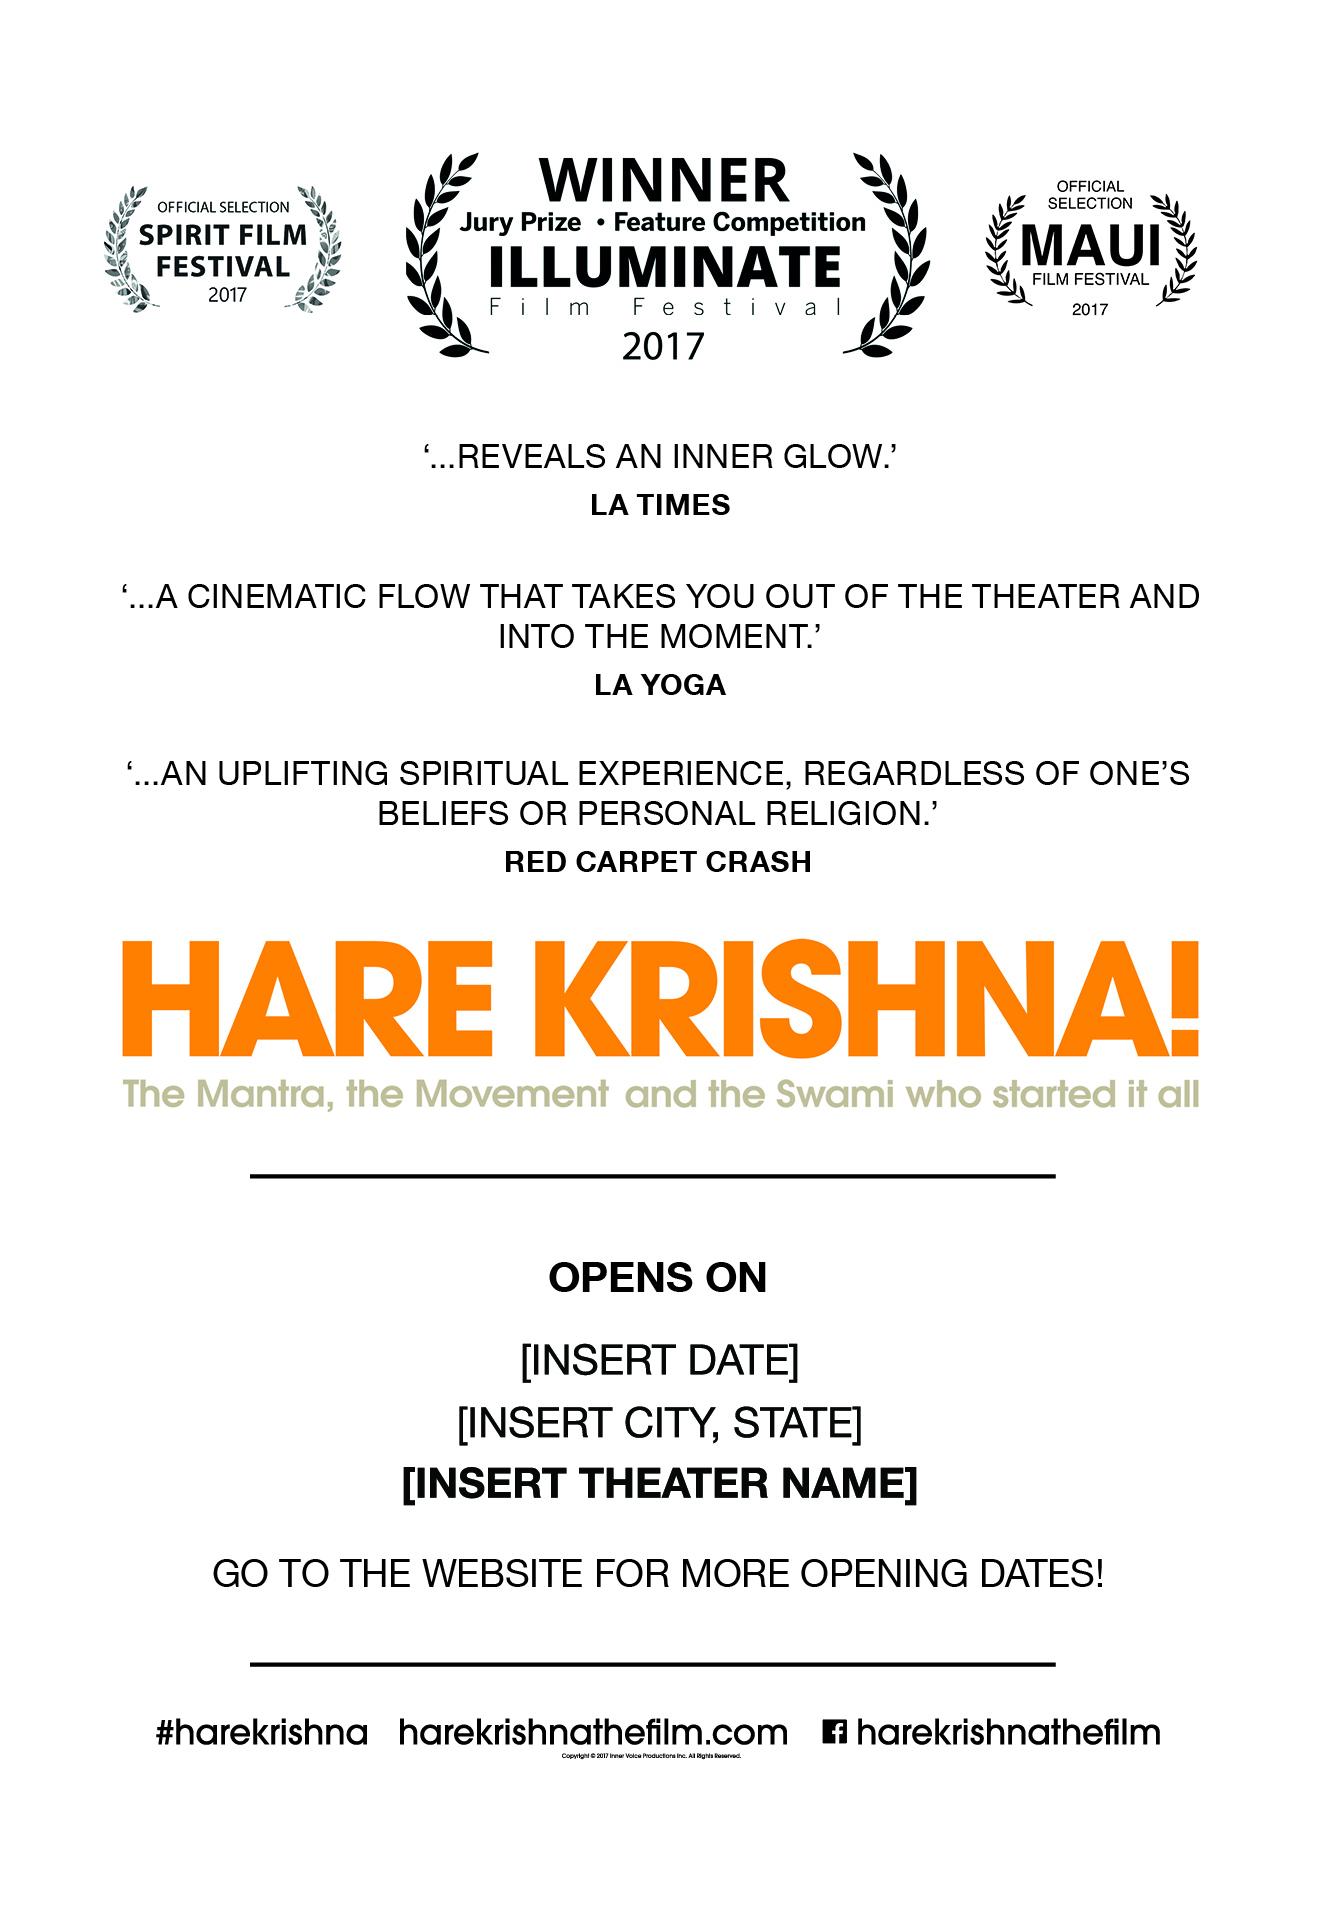 HareKrishna!-Postcard-BackSide(4%22x6%22).jpg